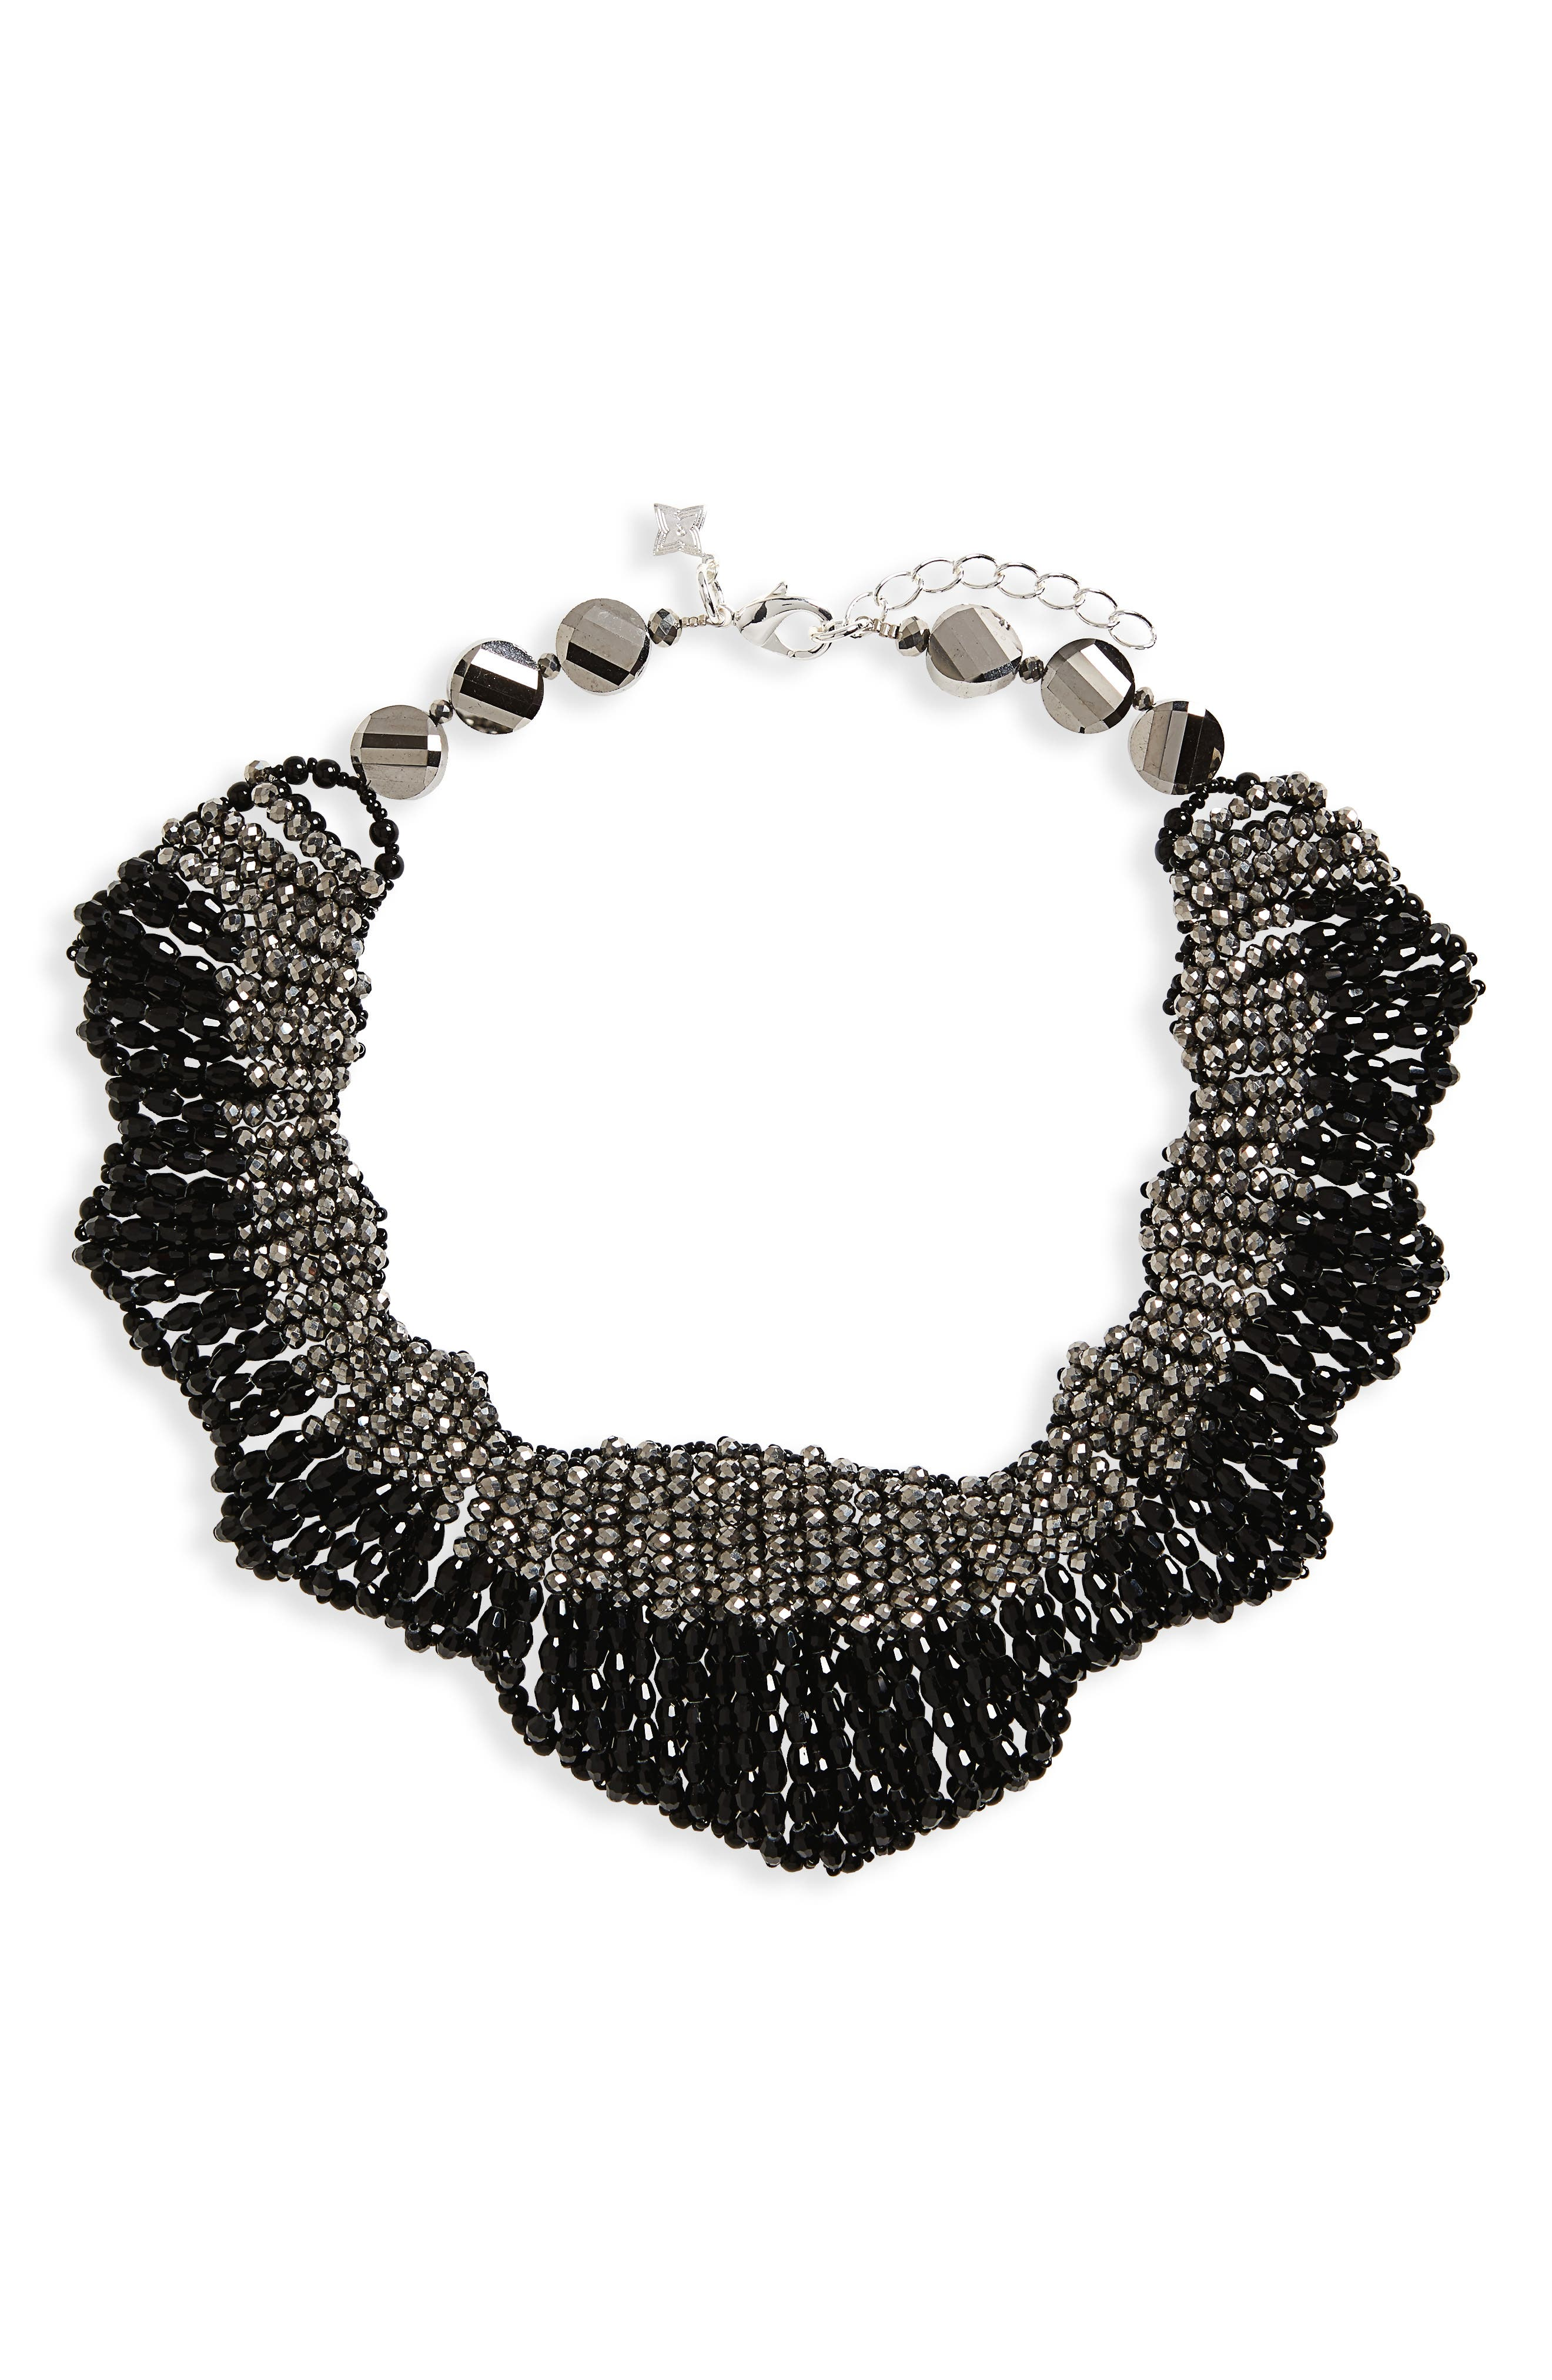 Main Image - Panacea Beaded Statement Collar Necklace